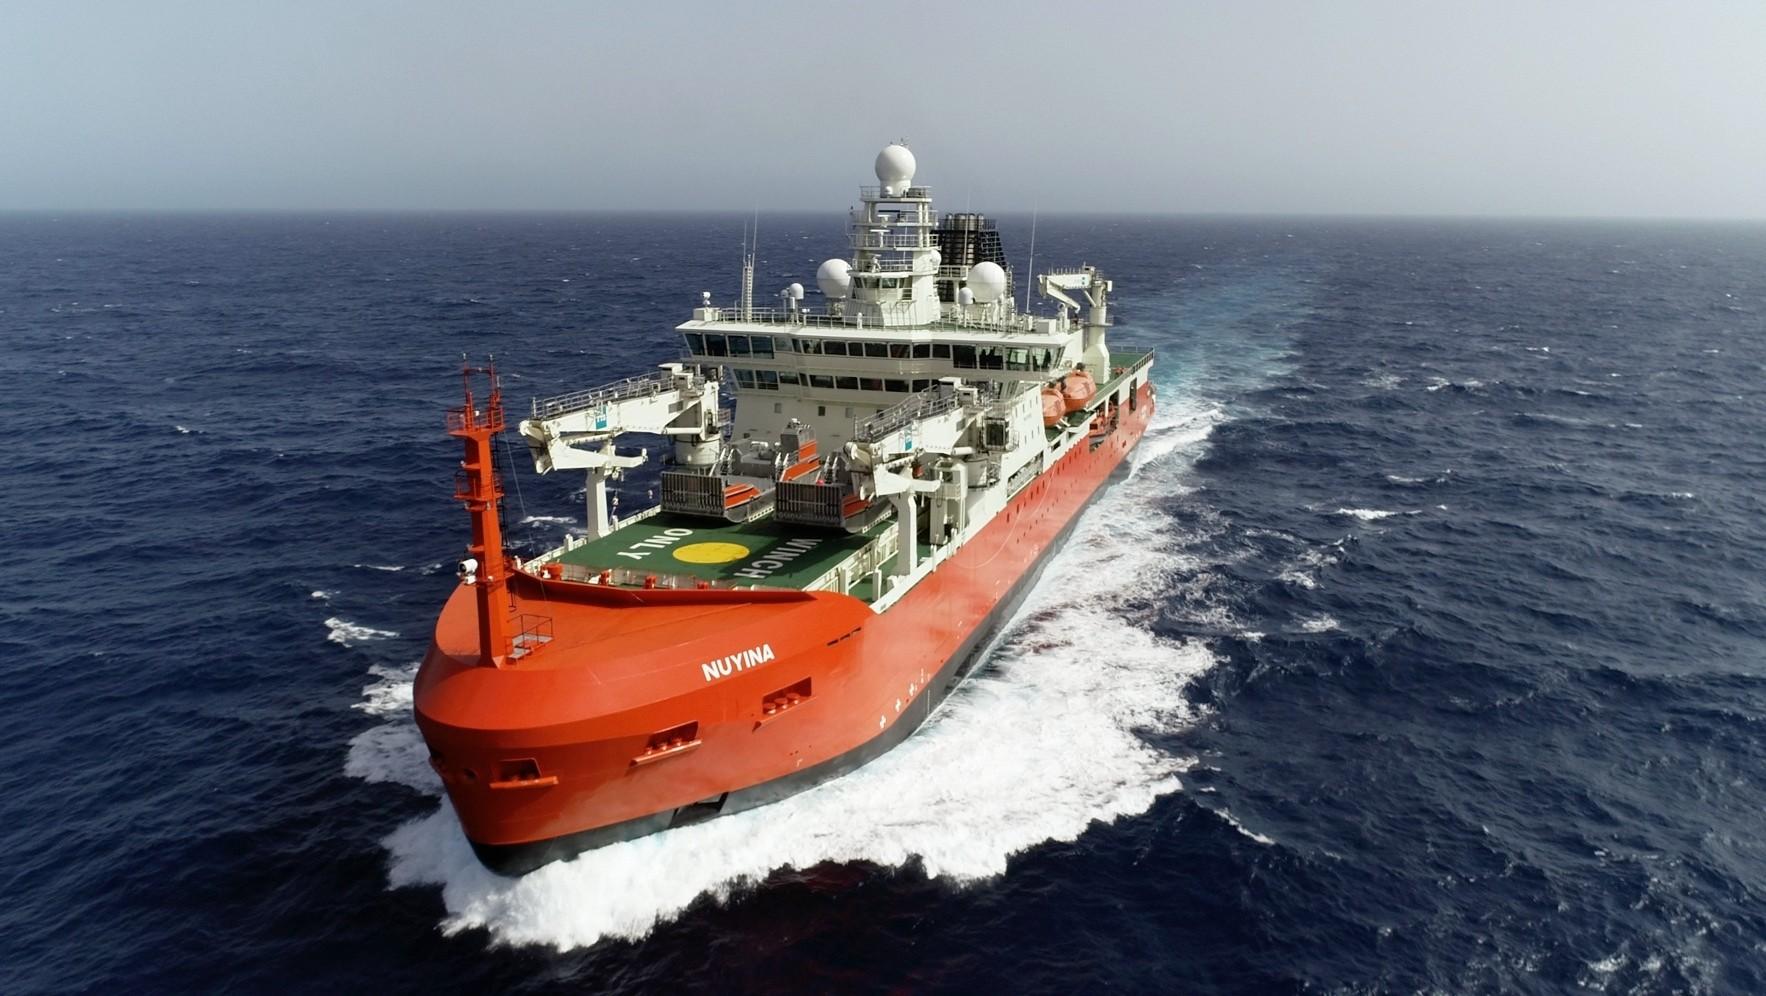 Australia's world-leading icebreaker about to arrive in Hobart